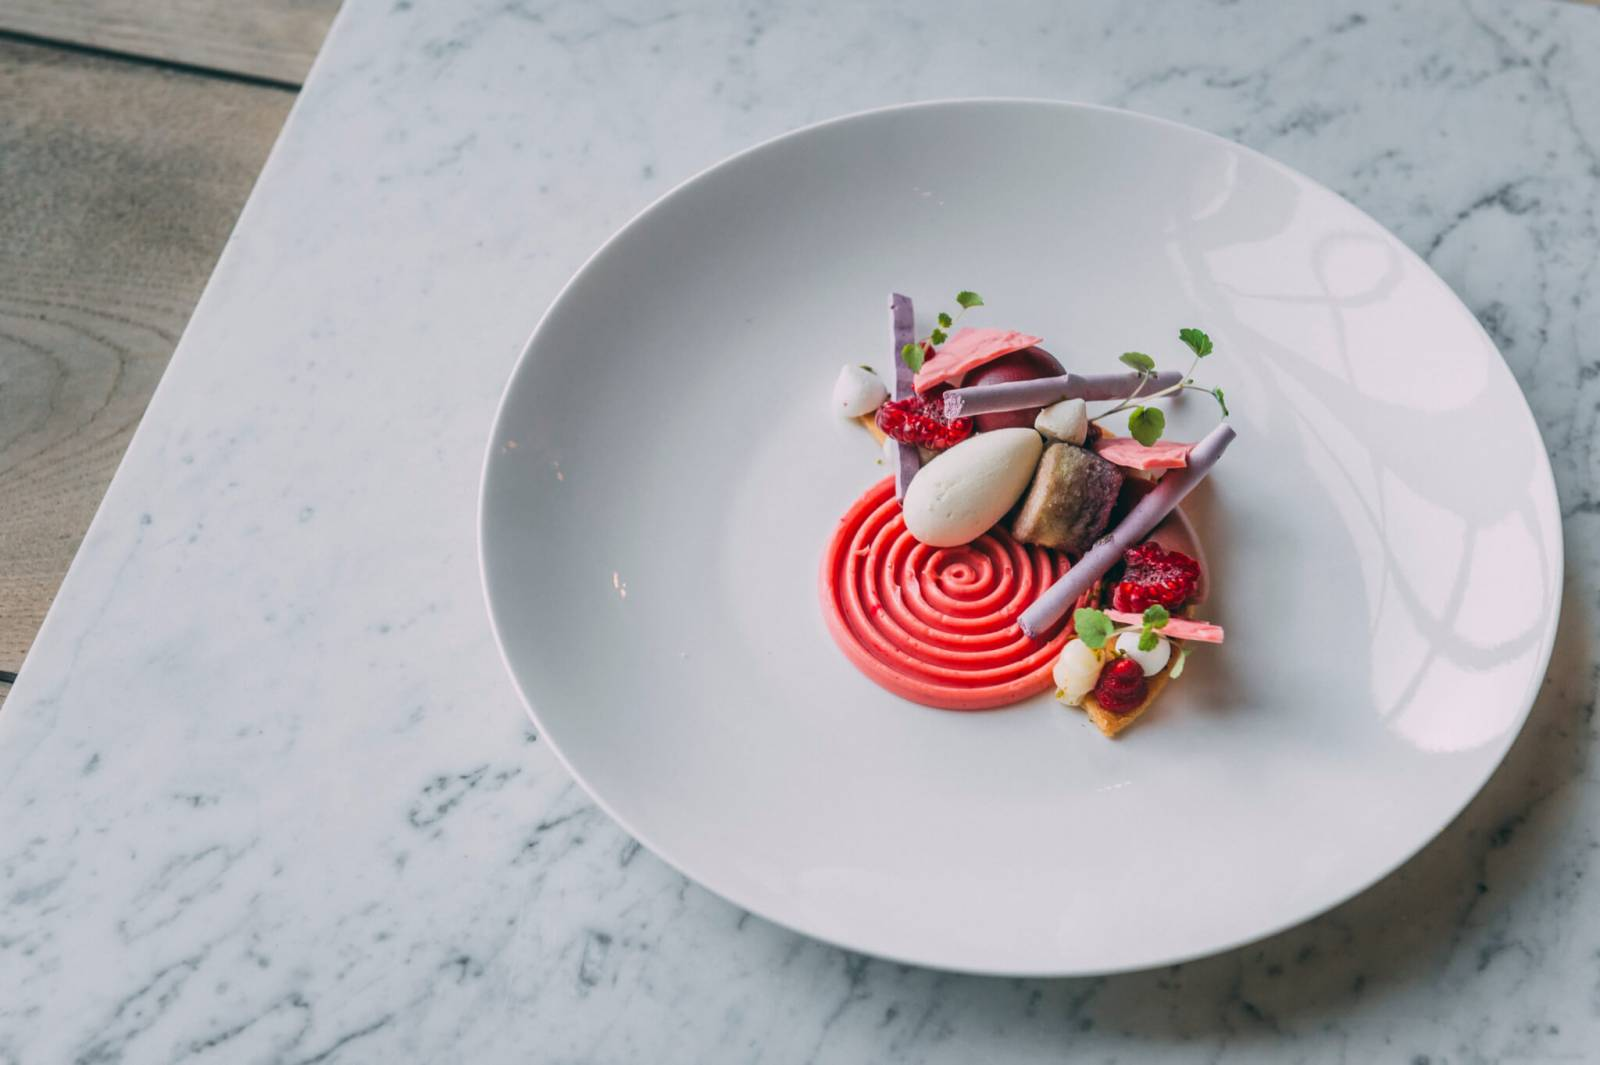 DESS-Ruby-chocolade-–-yoghurt-–-frambozenlikeur-–-pistache-